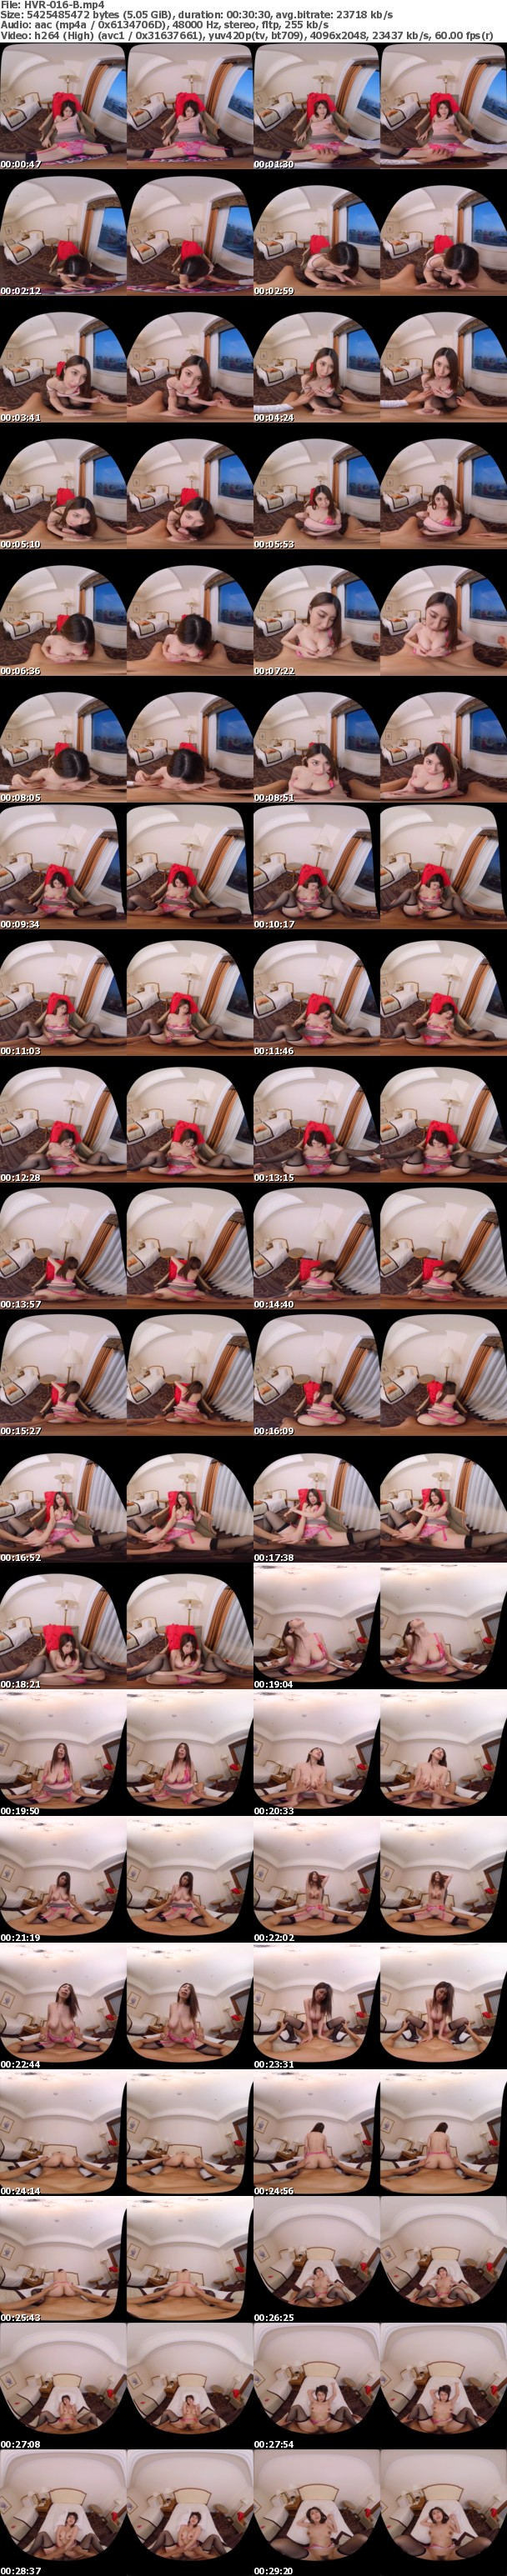 (VR) HVR-016 【野外露出×個撮ハメ撮り】【神柔乳Iカップ】大迫力ロケット乳が超爆揺!愛液グッショグショ激濡れパティシエに濃厚精子をたっぷり中出し!!